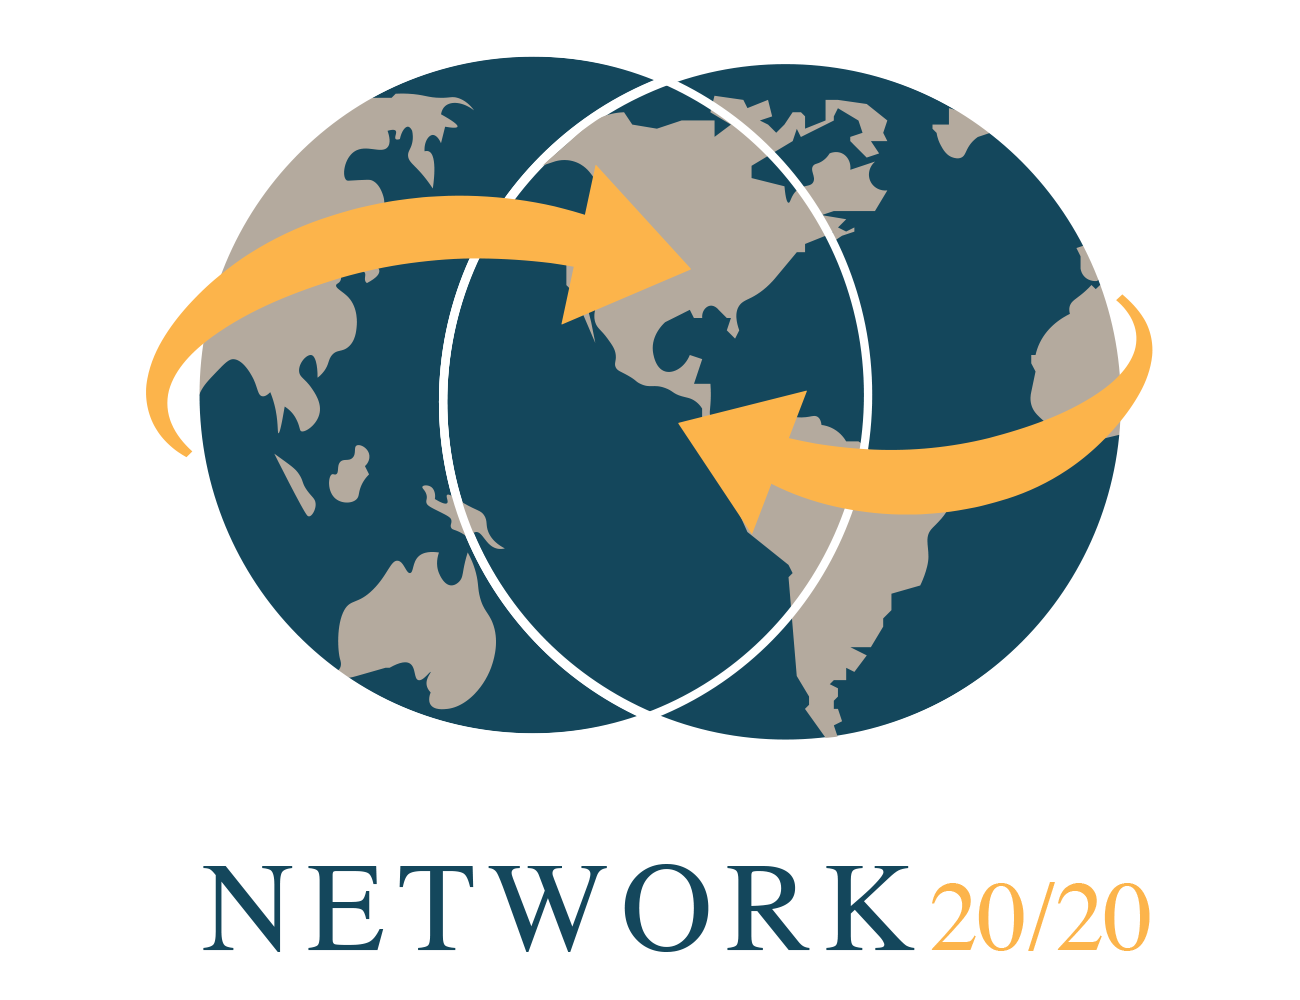 Network2020-logo